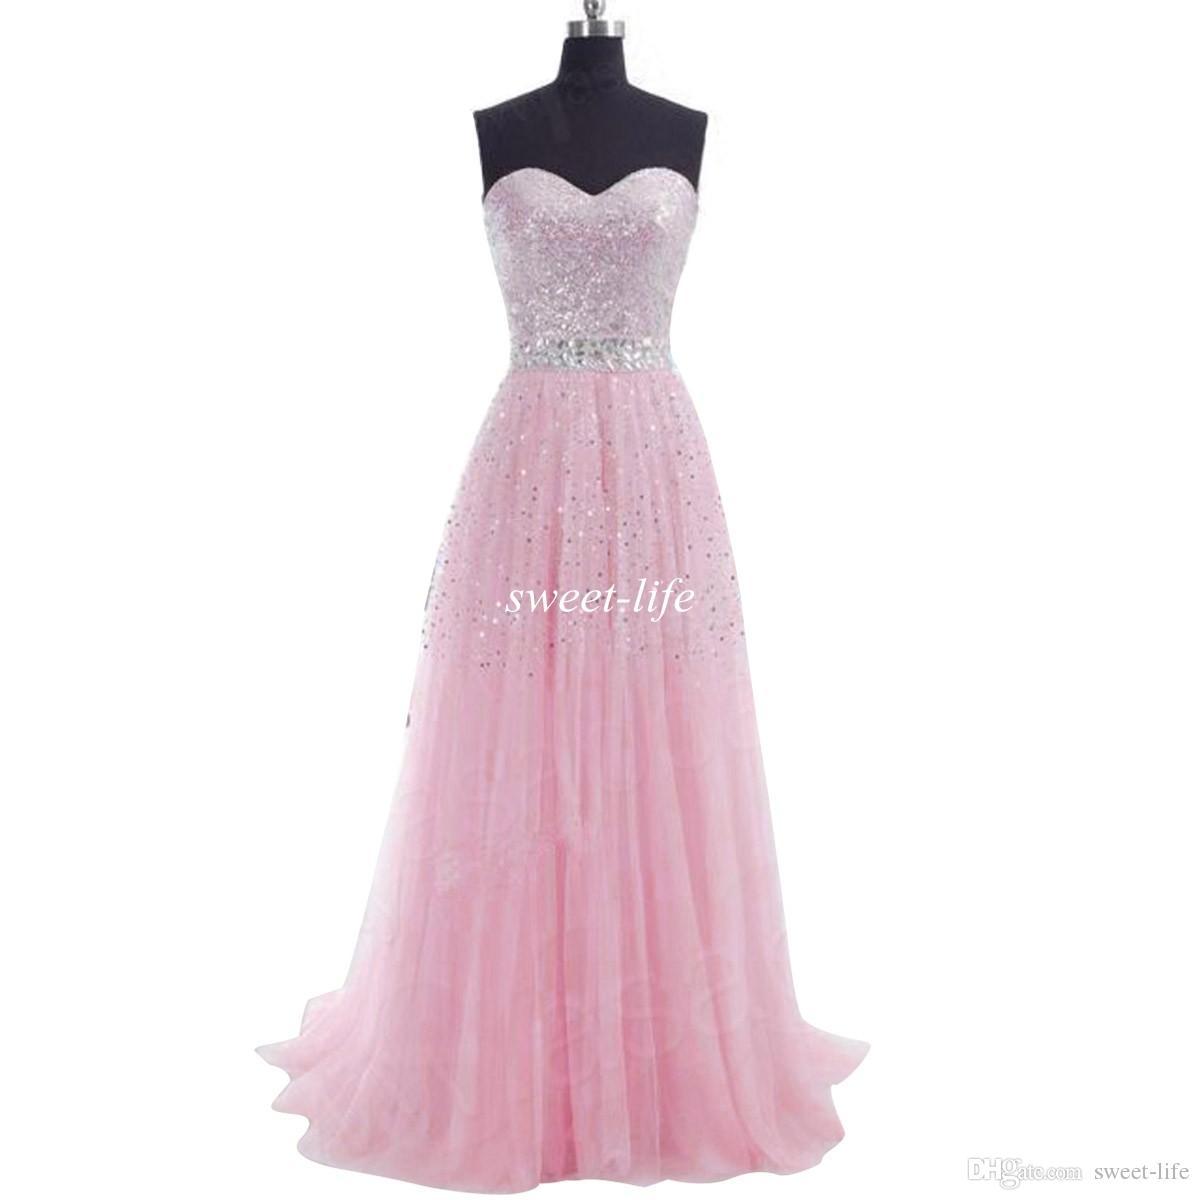 Em estoque 2019 barato longo vestidos de baile lantejoulas uma linha querida tule lace up lilás azul coral festa vestidos de dama de honra vestidos de noite